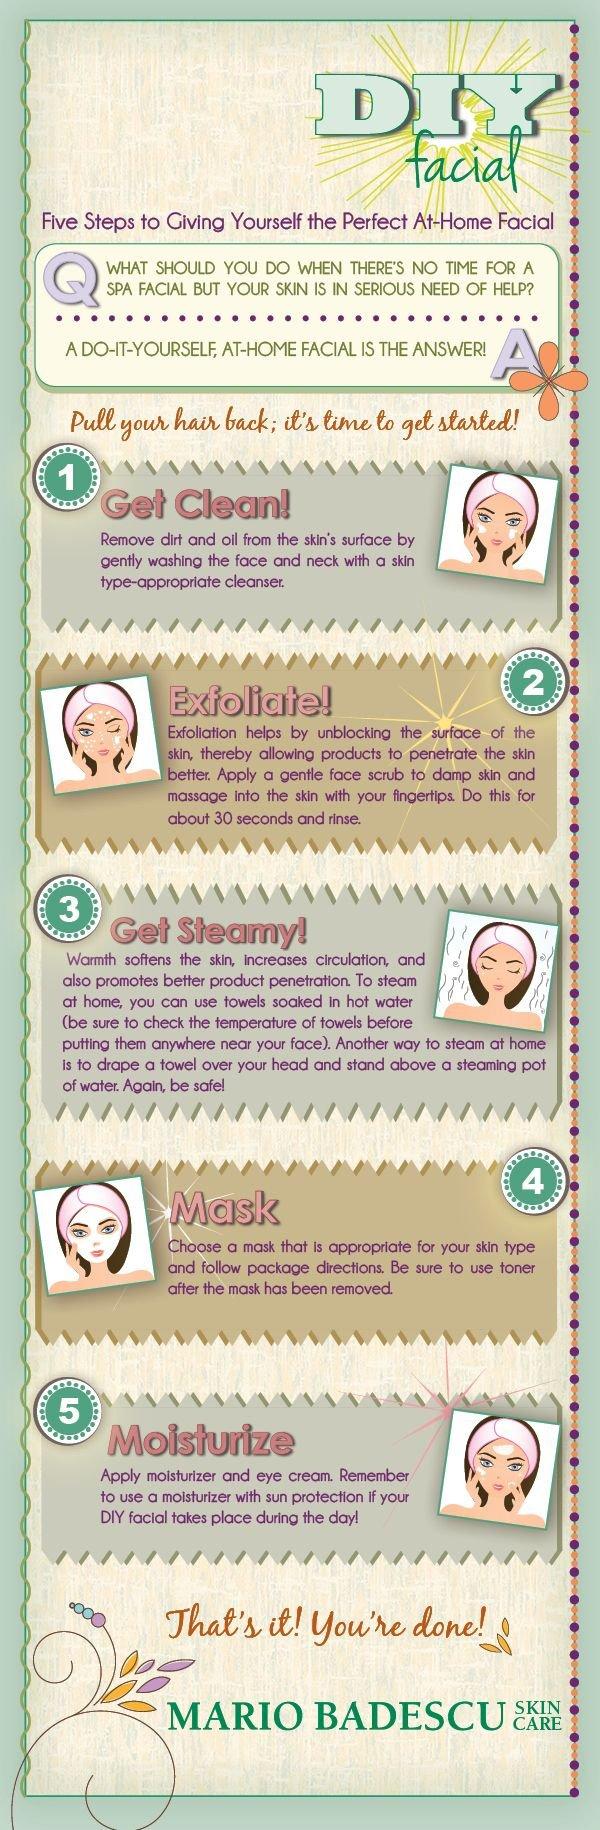 19 fabulous homemade steam facials for tired skin the diy facial process solutioingenieria Images